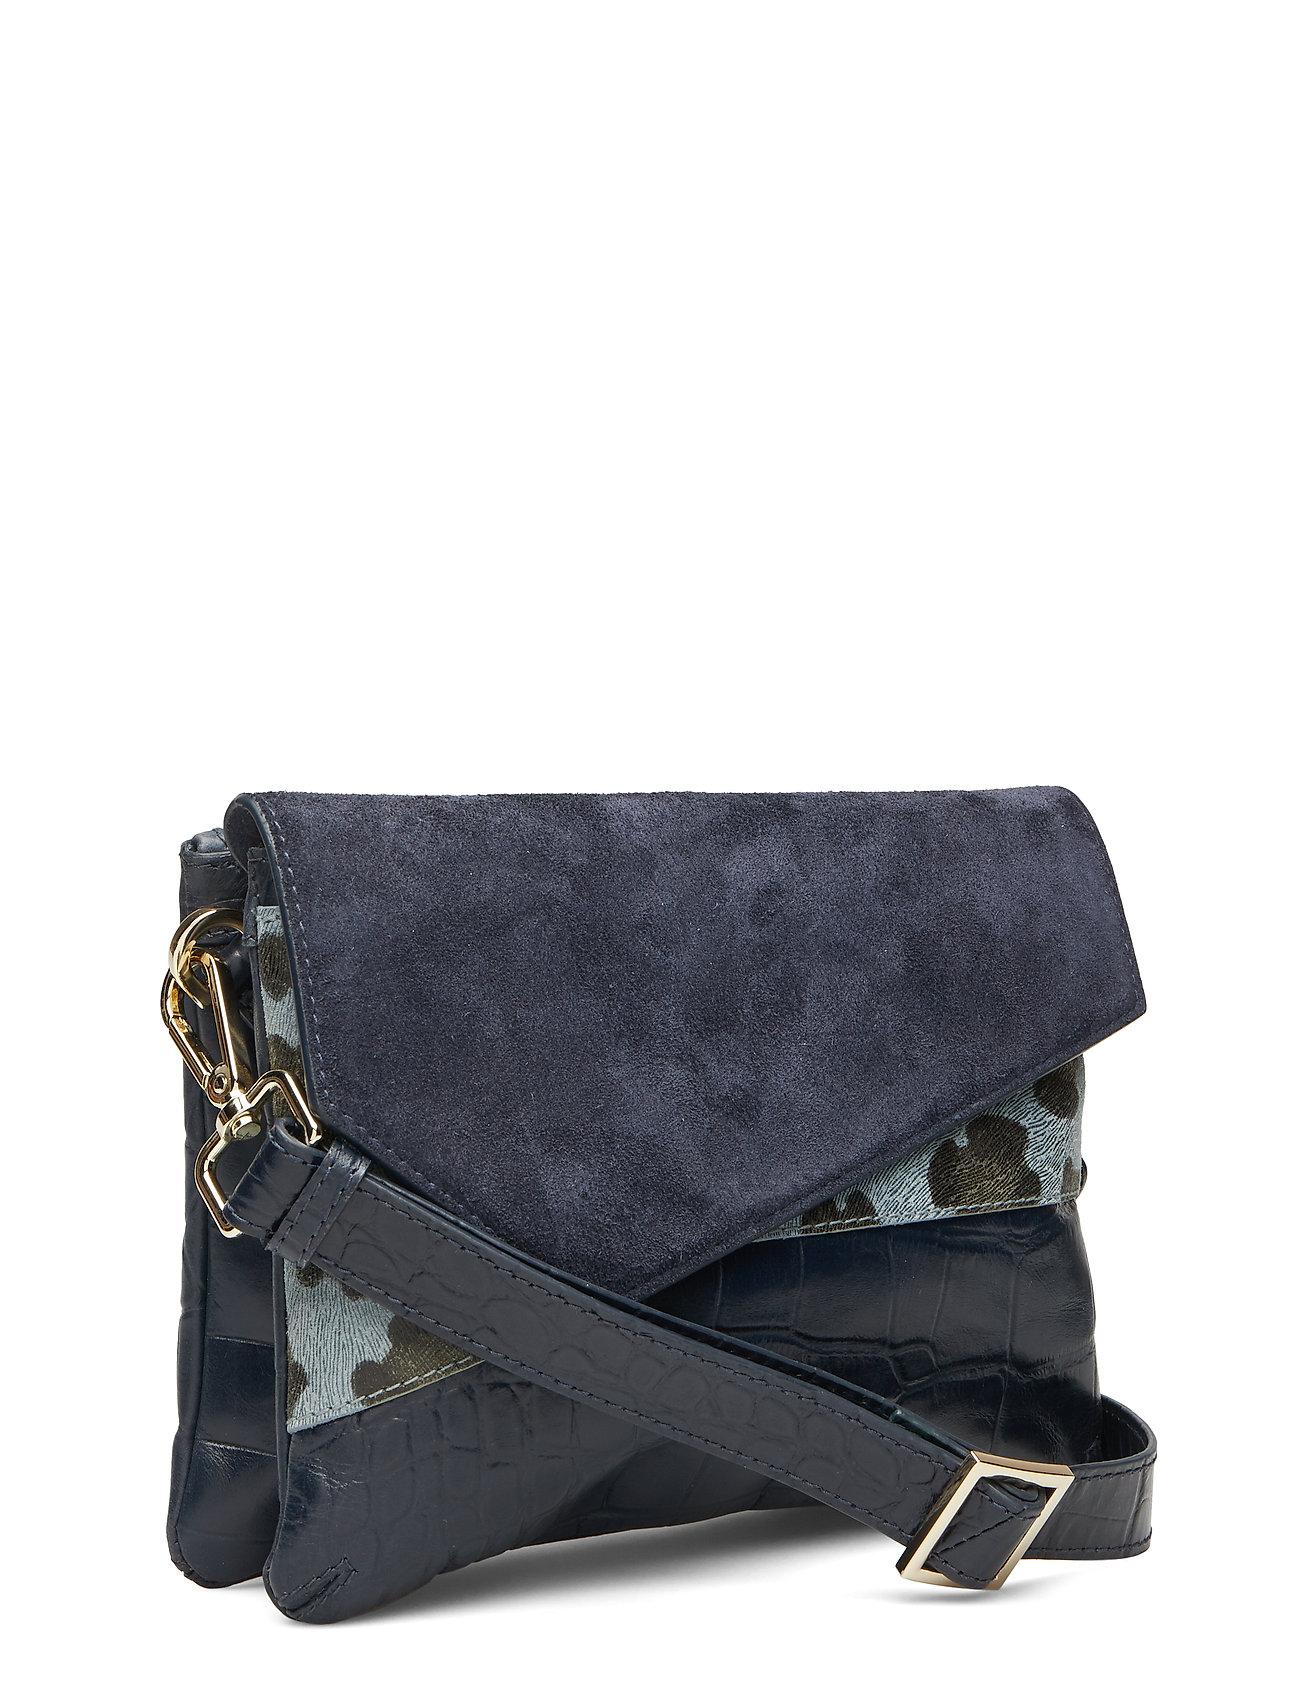 Berlin NynnemarineAdax Bag Shoulder Berlin Shoulder Bag IYb76mfgvy